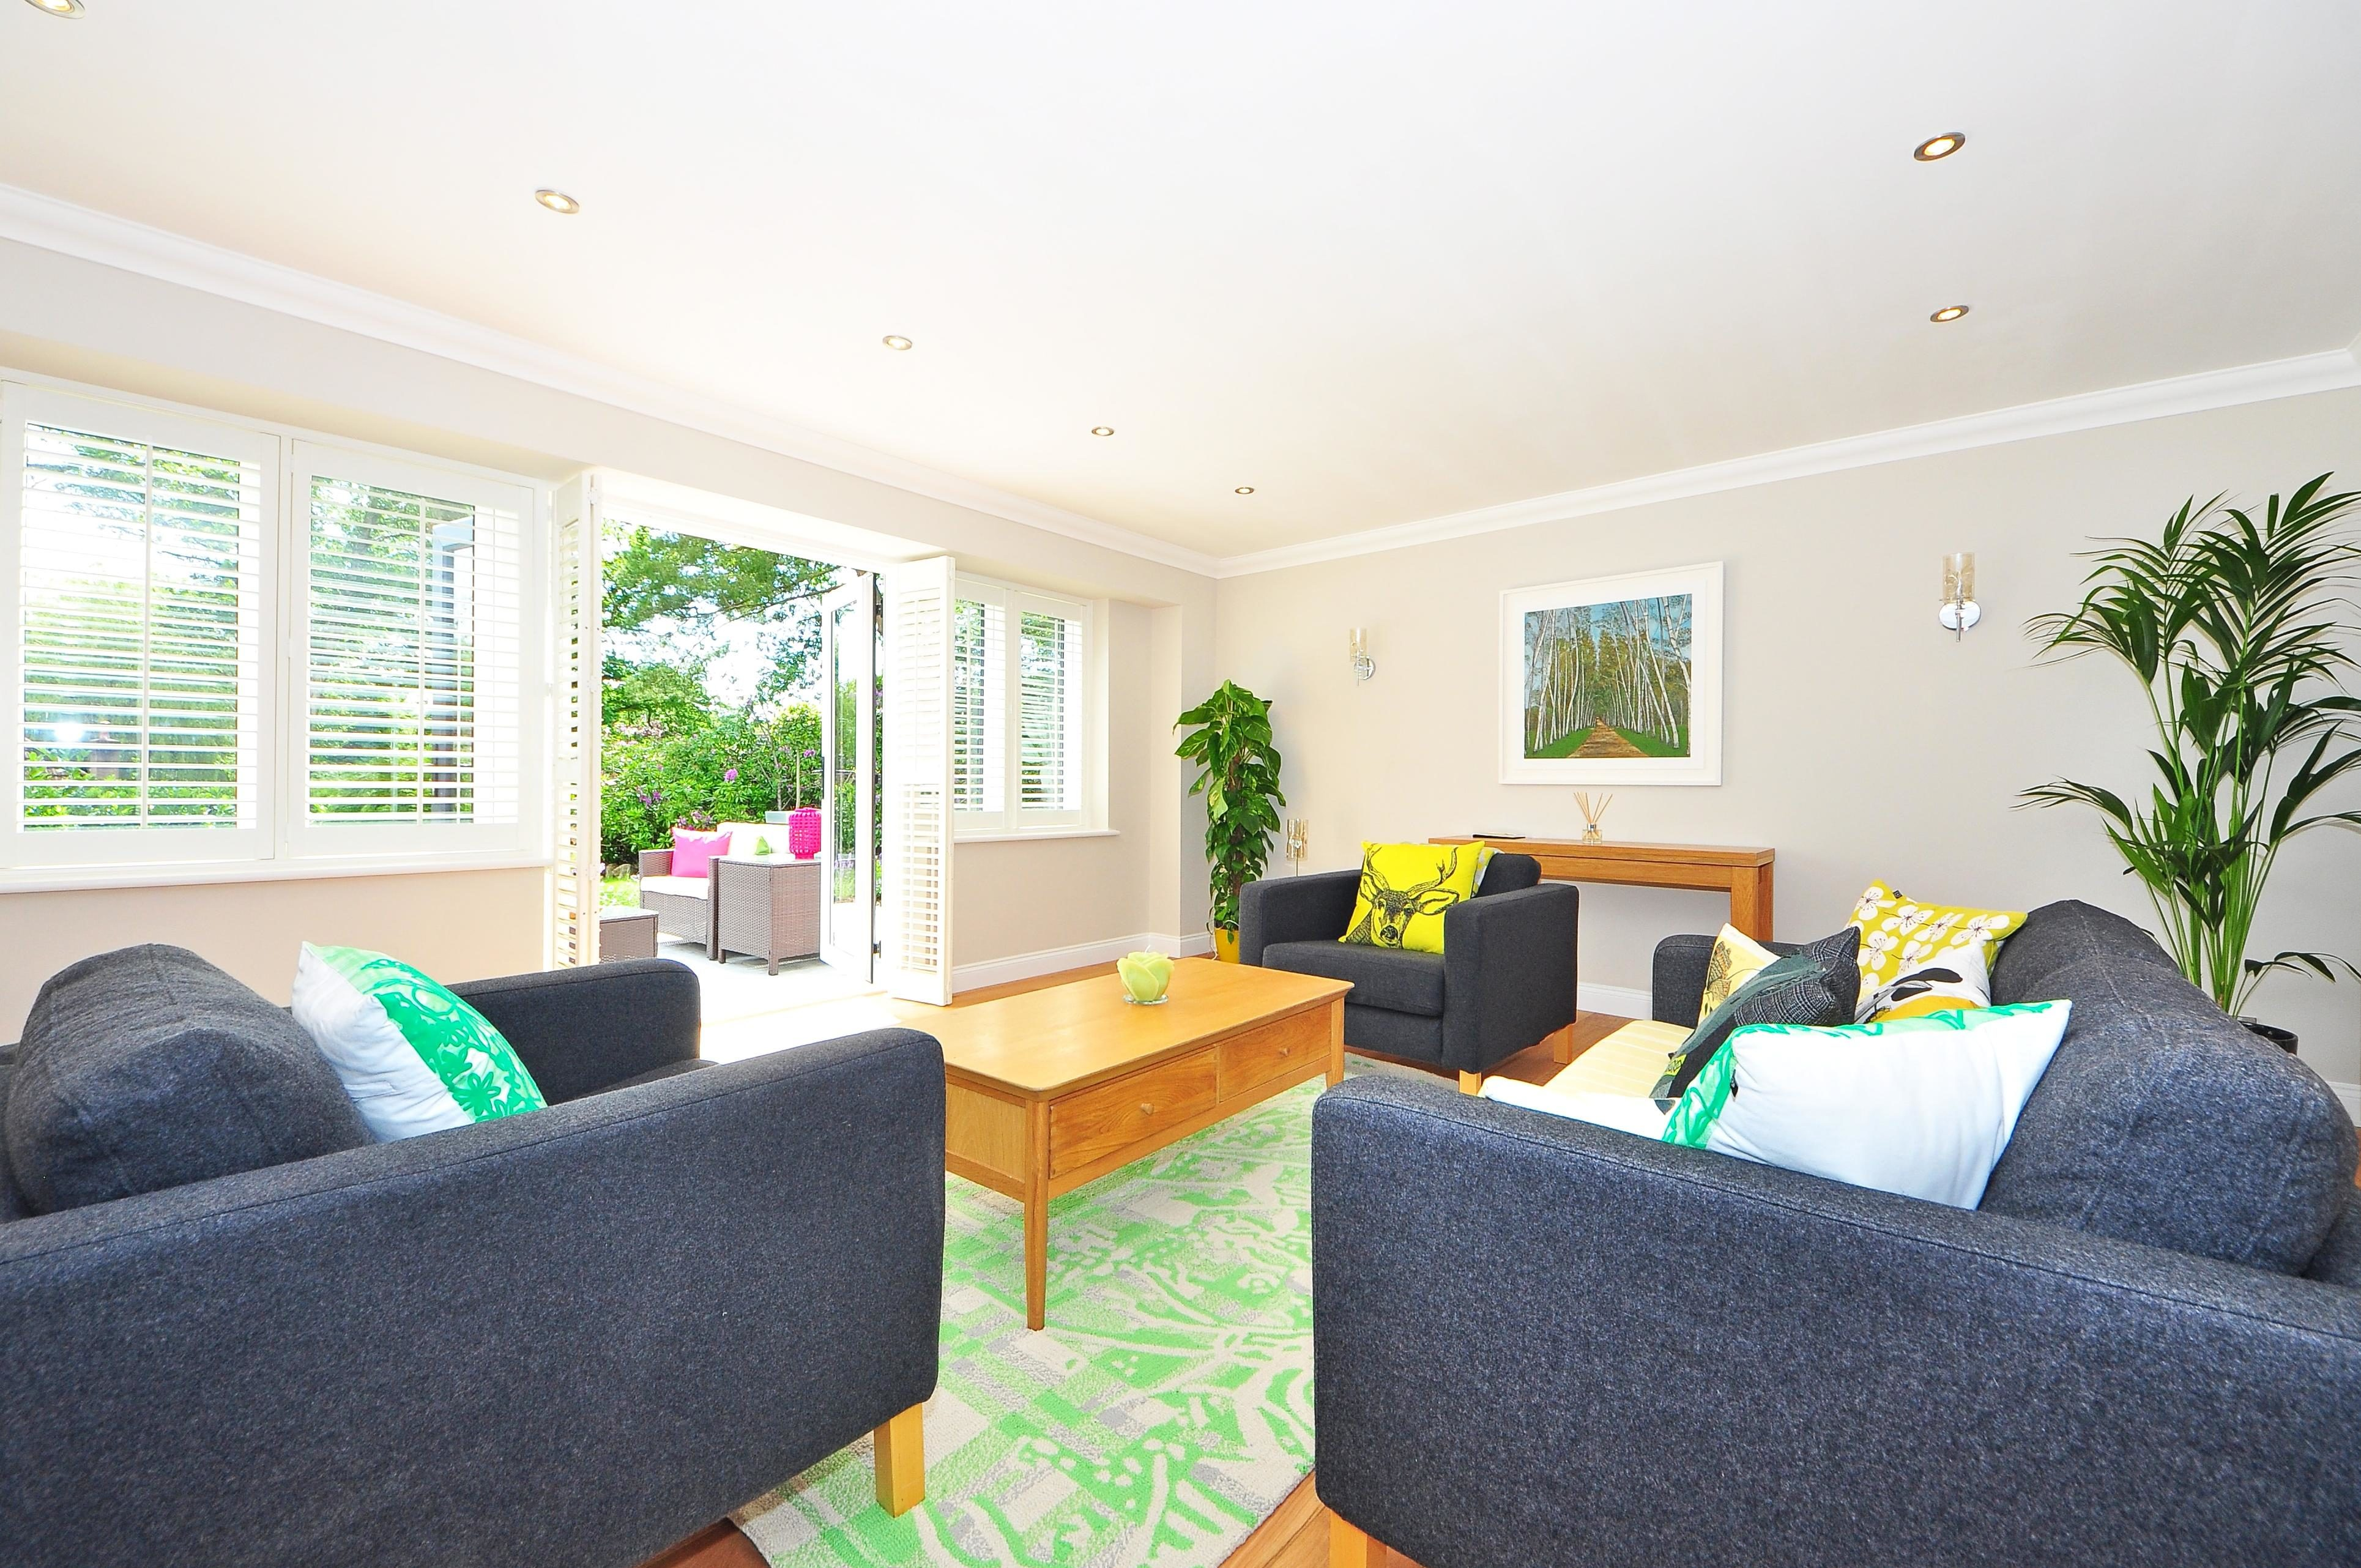 Imagen gratis: muebles, sala, sofá, interior, casa, silla, casa ...